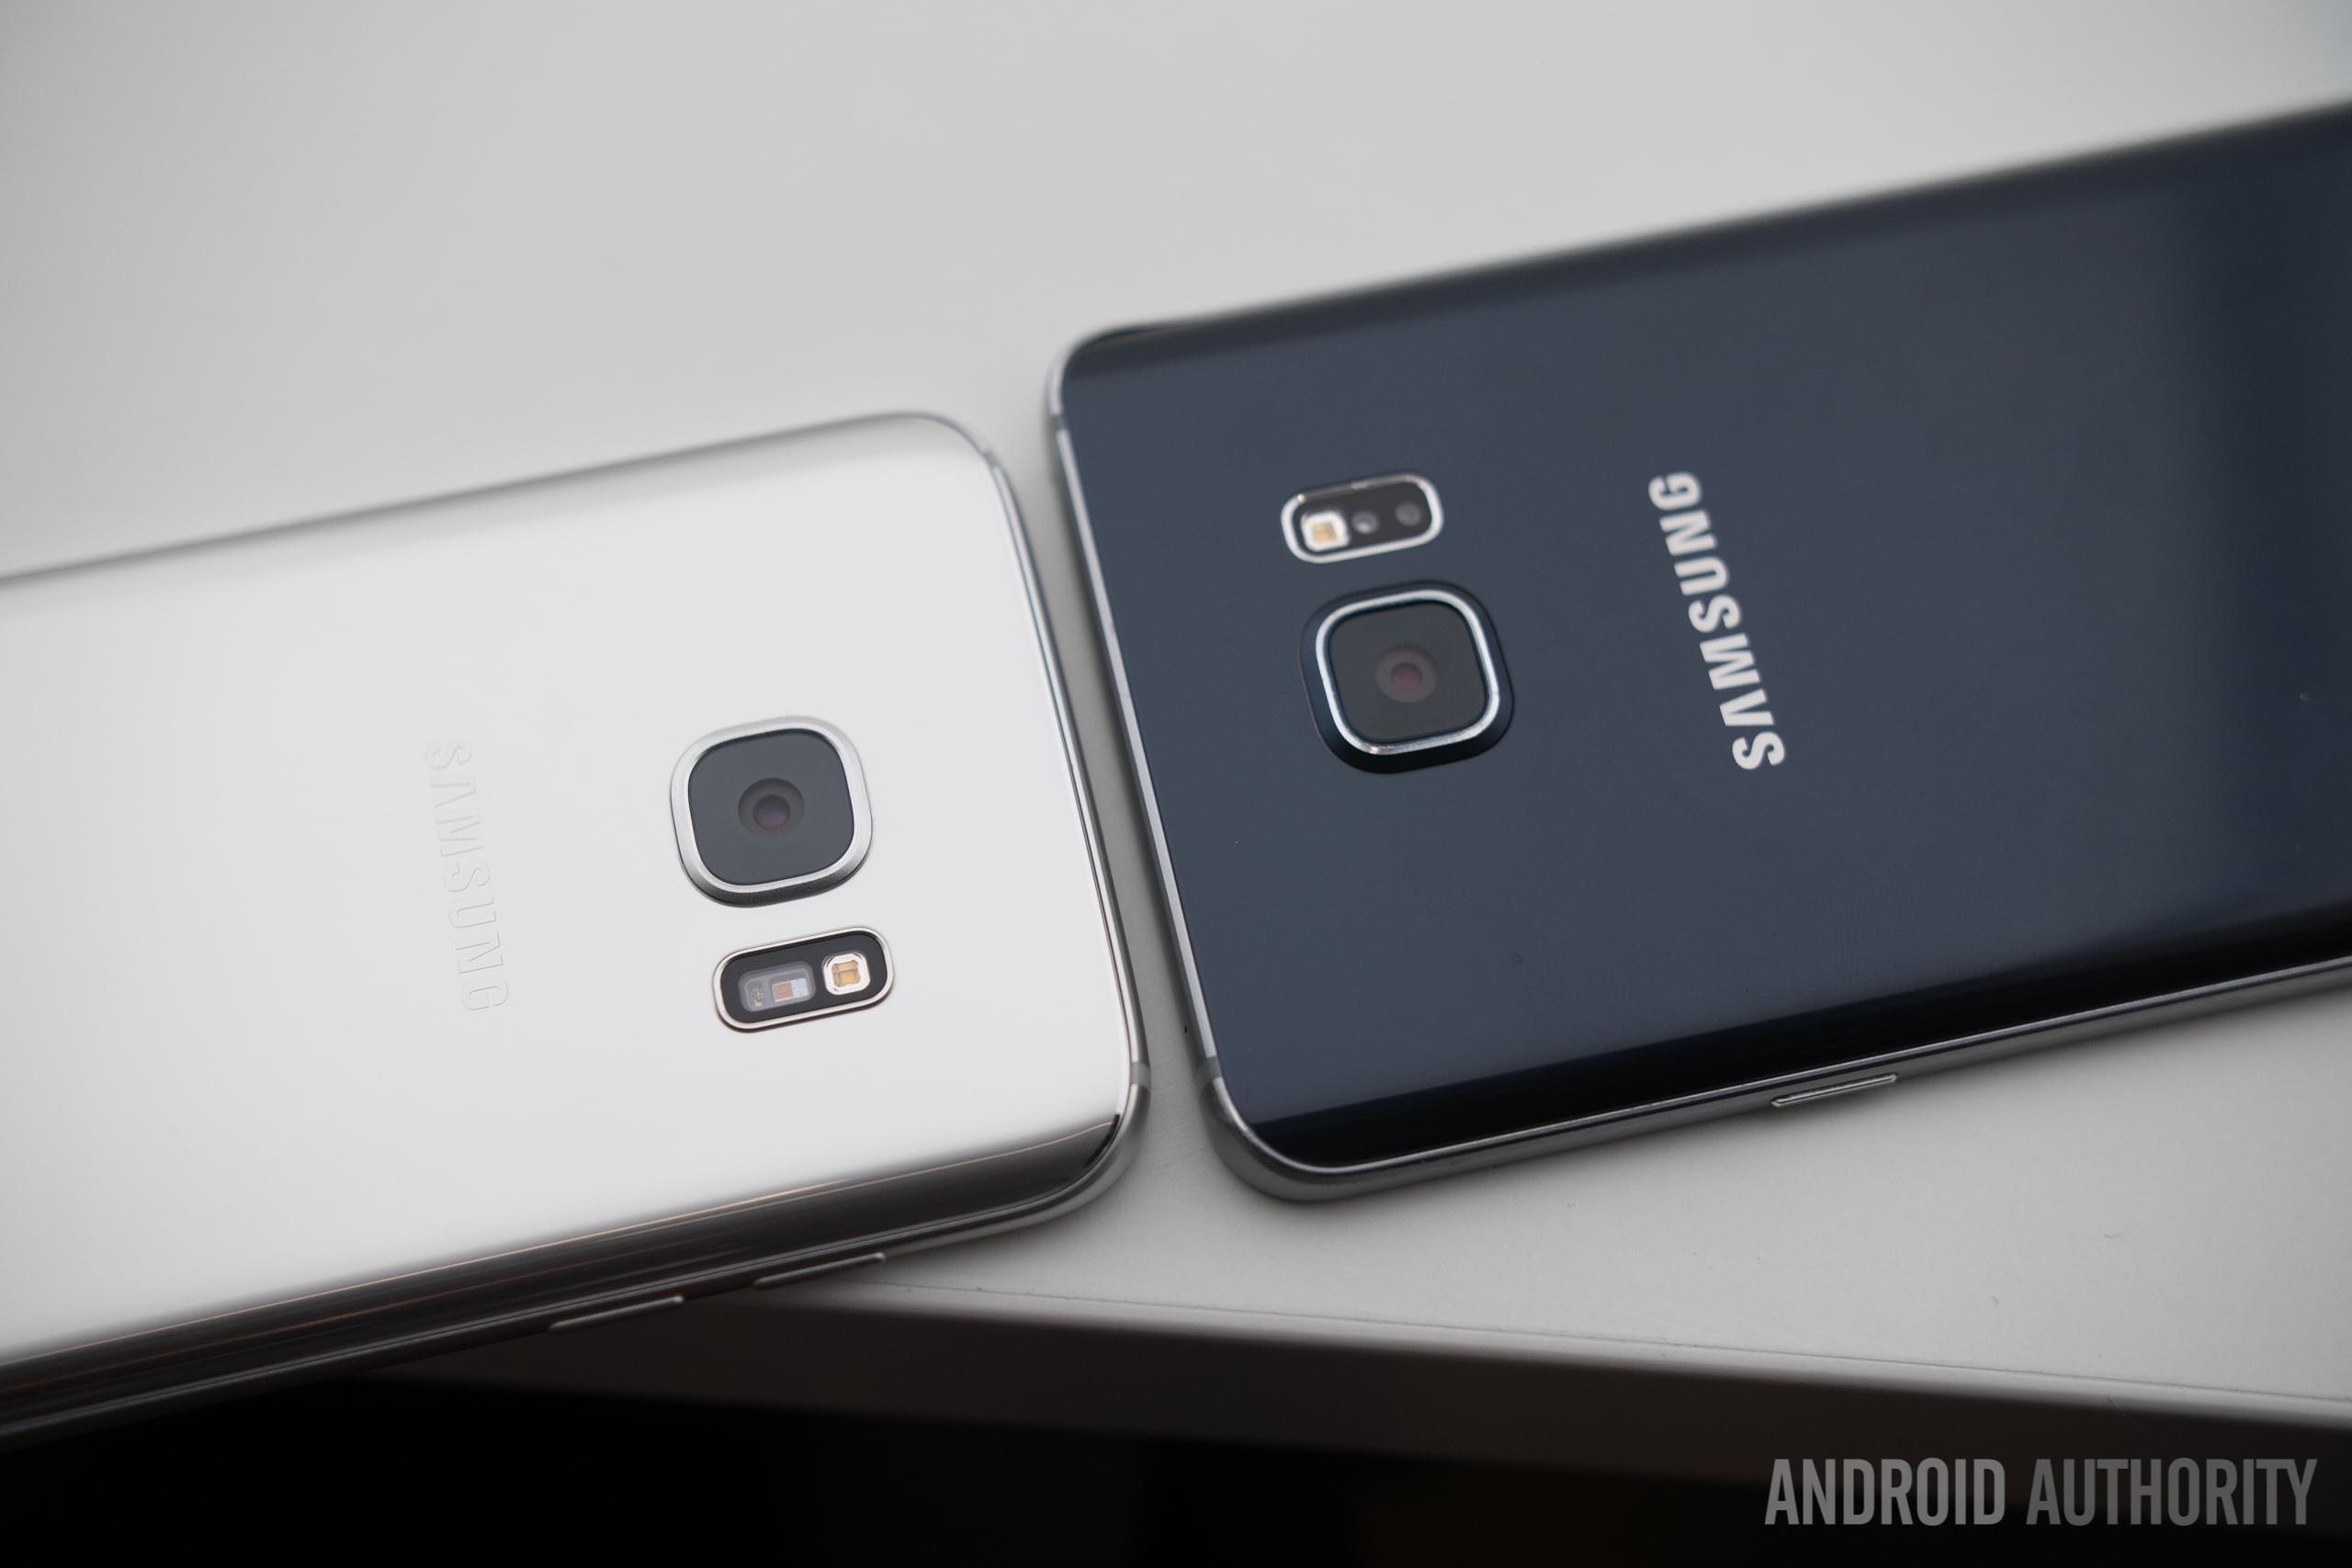 Samsung-Galaxy-S7-vs-Samsung-Galaxy-Note-5-7